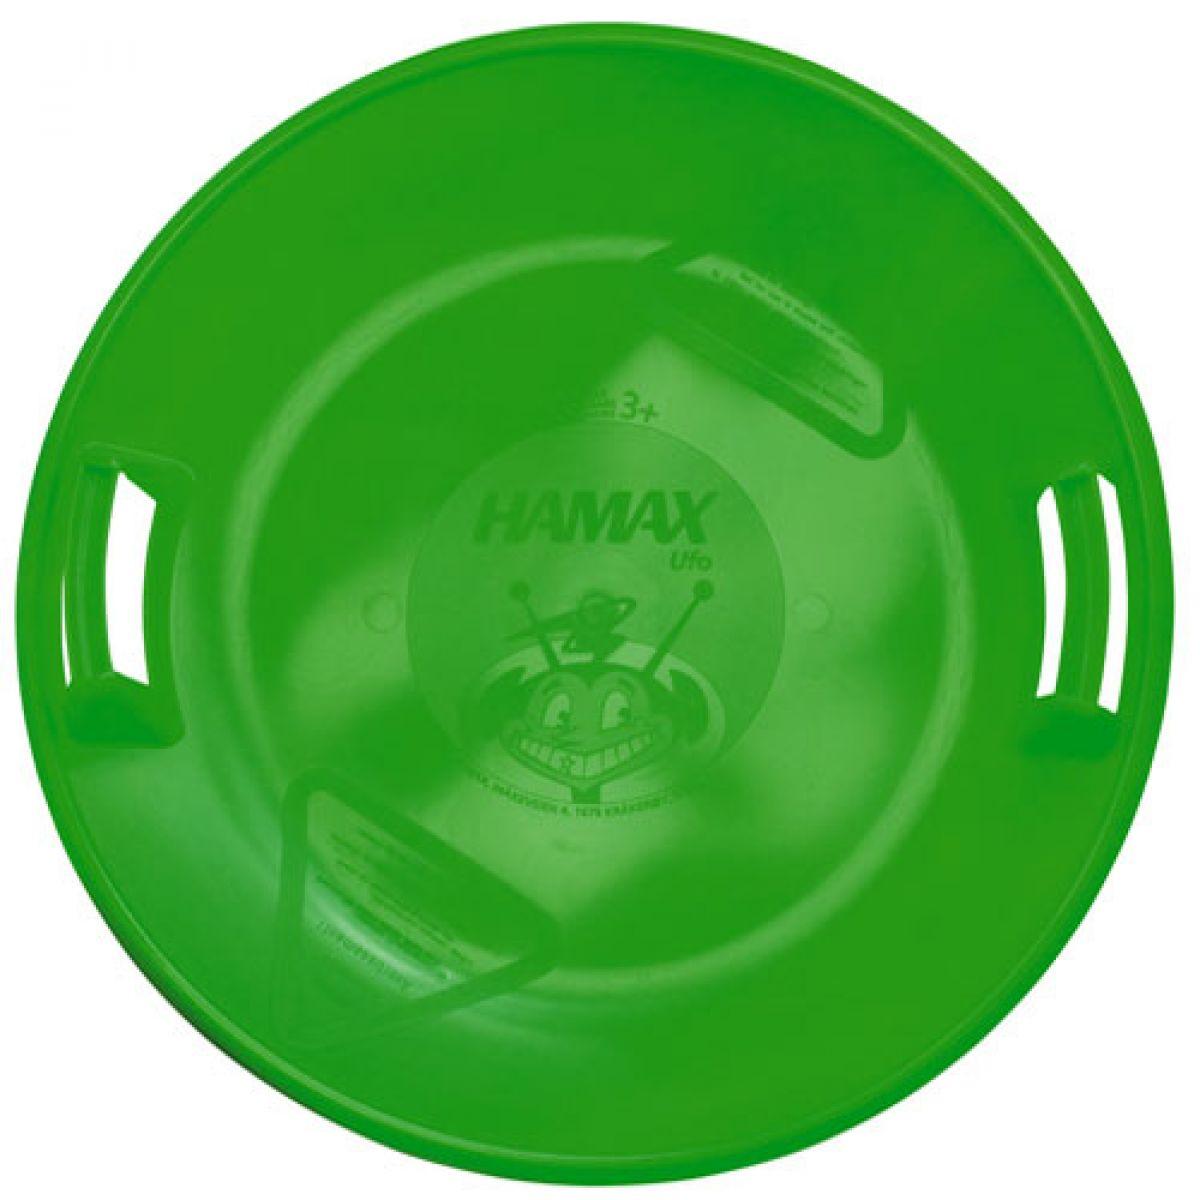 Hamax UFO green Hamax